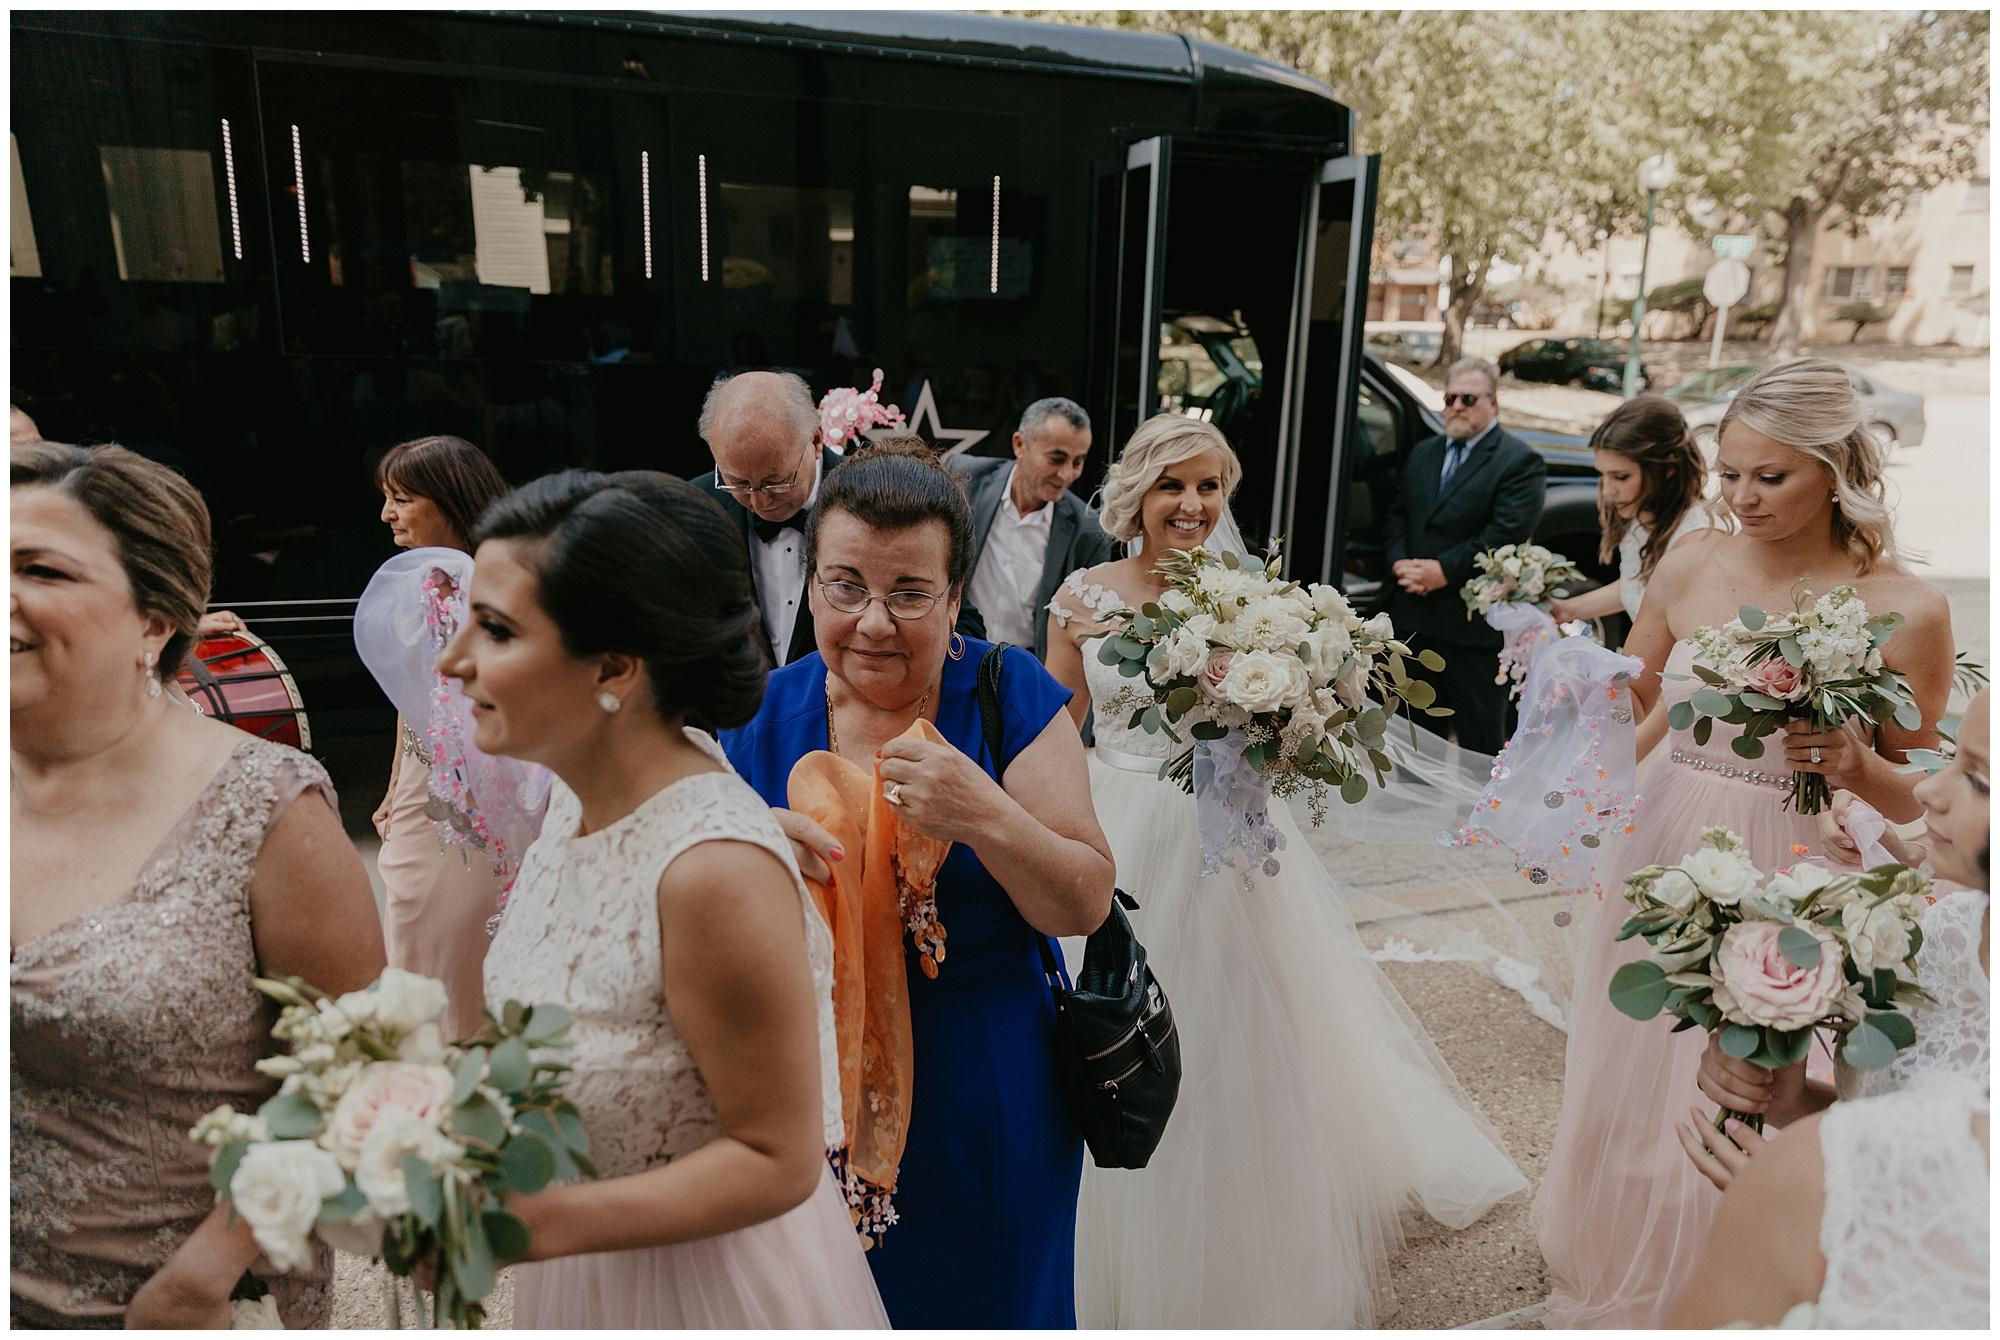 pear_tree_estate_wedding_champaign_il_wright_photographs_jj_0039.jpg